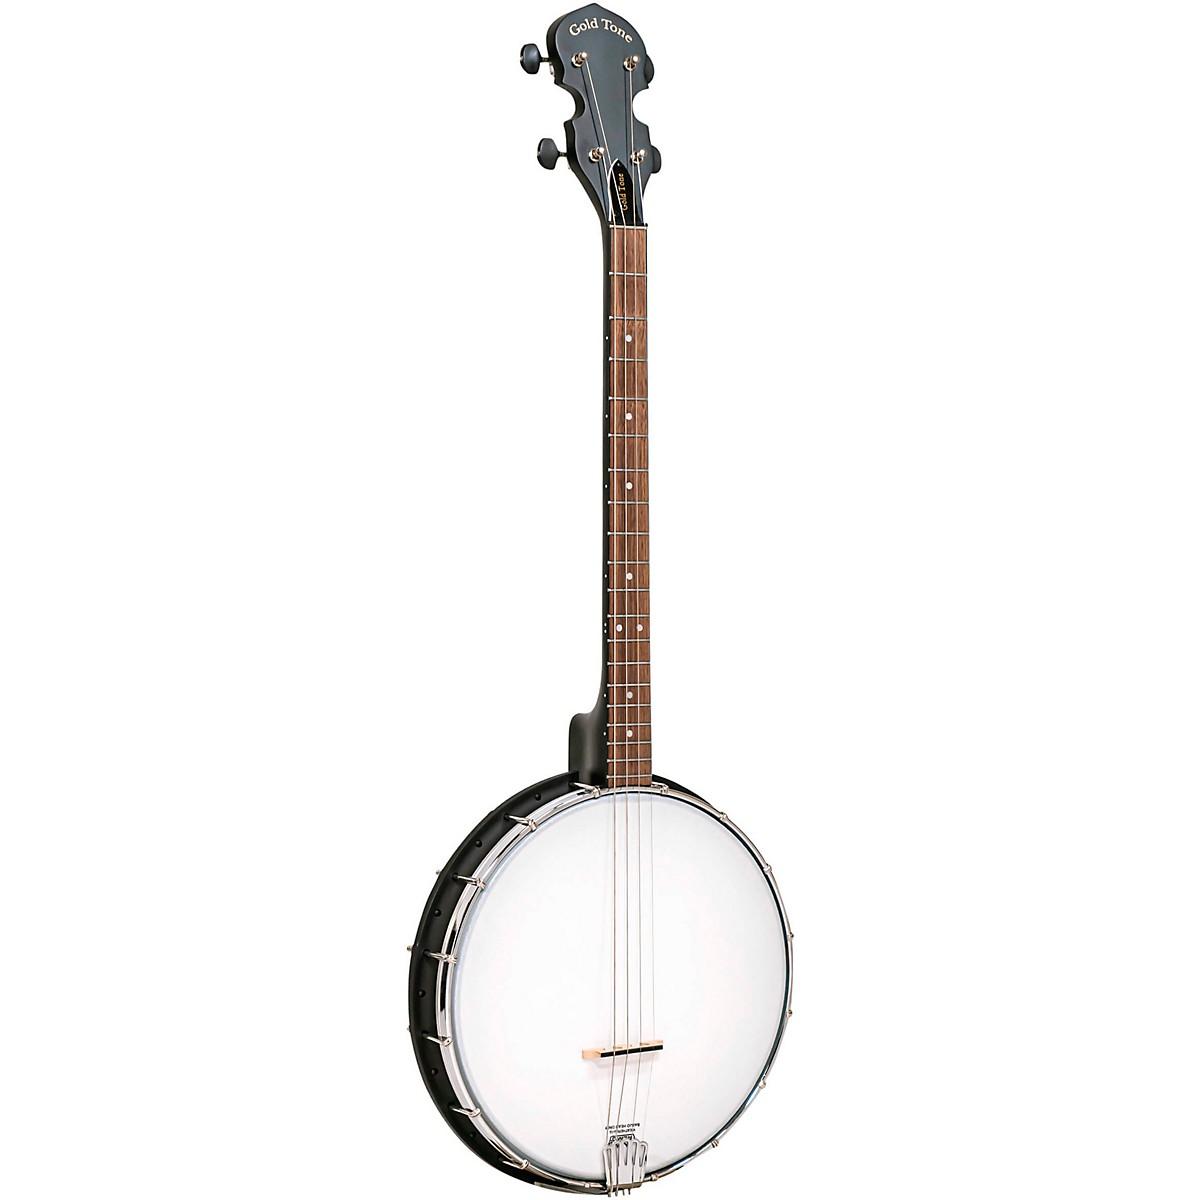 Gold Tone AC-4 Composite 4-String Openback Tenor Banjo